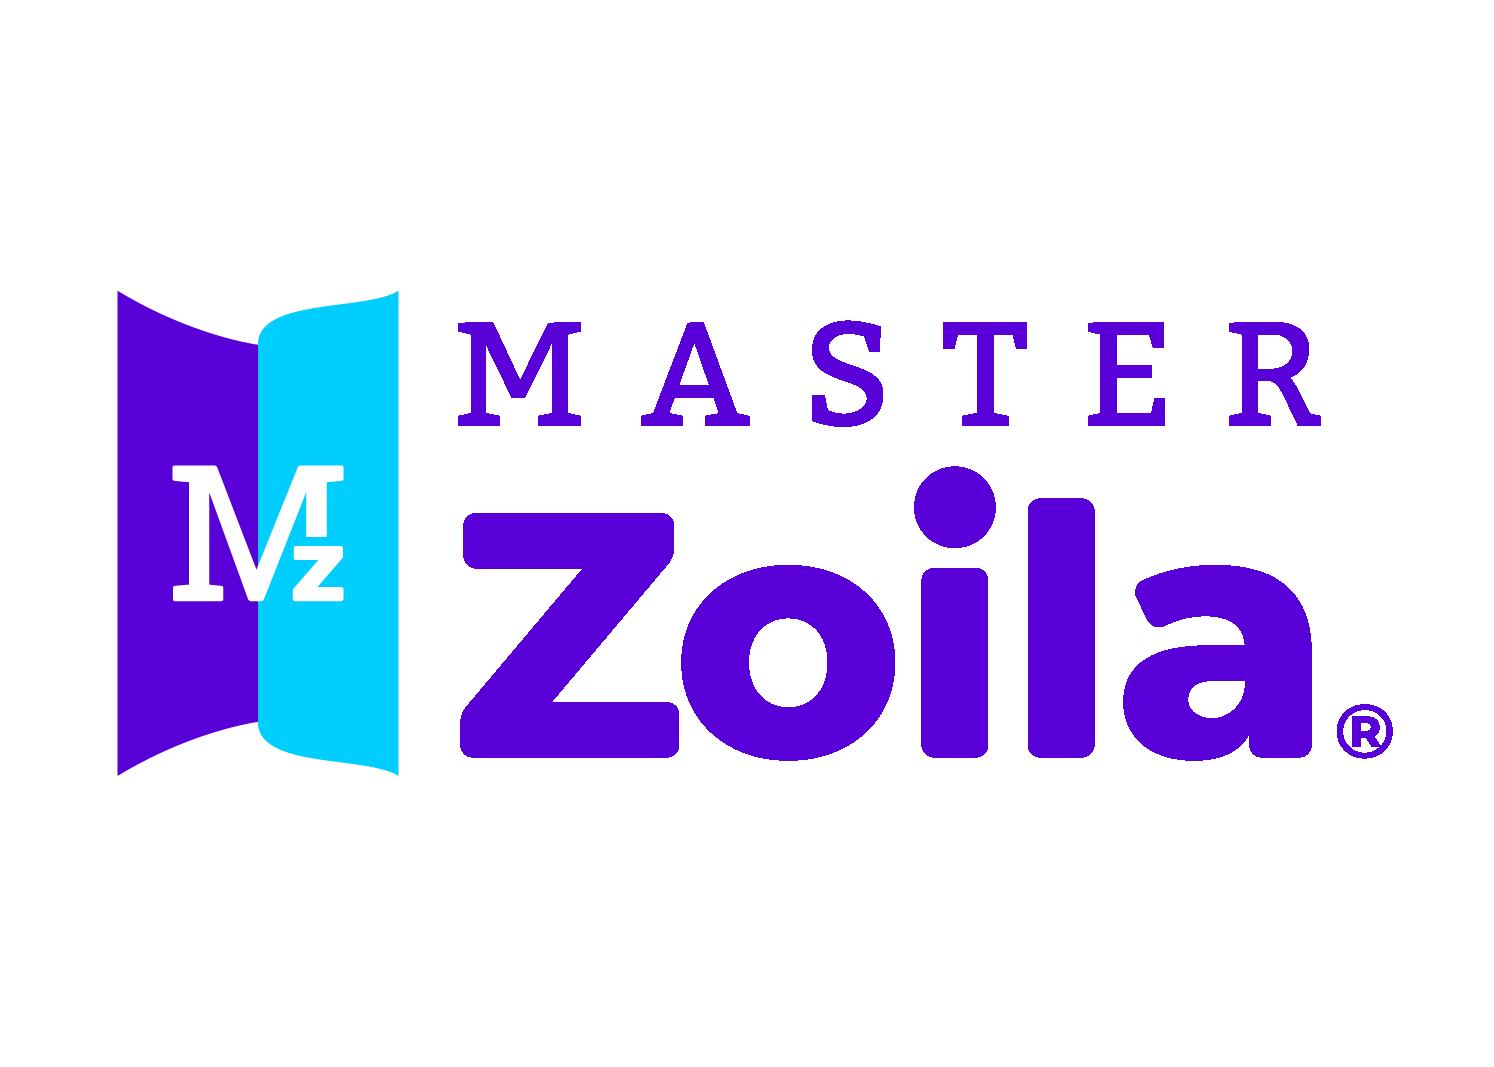 Master Zoila